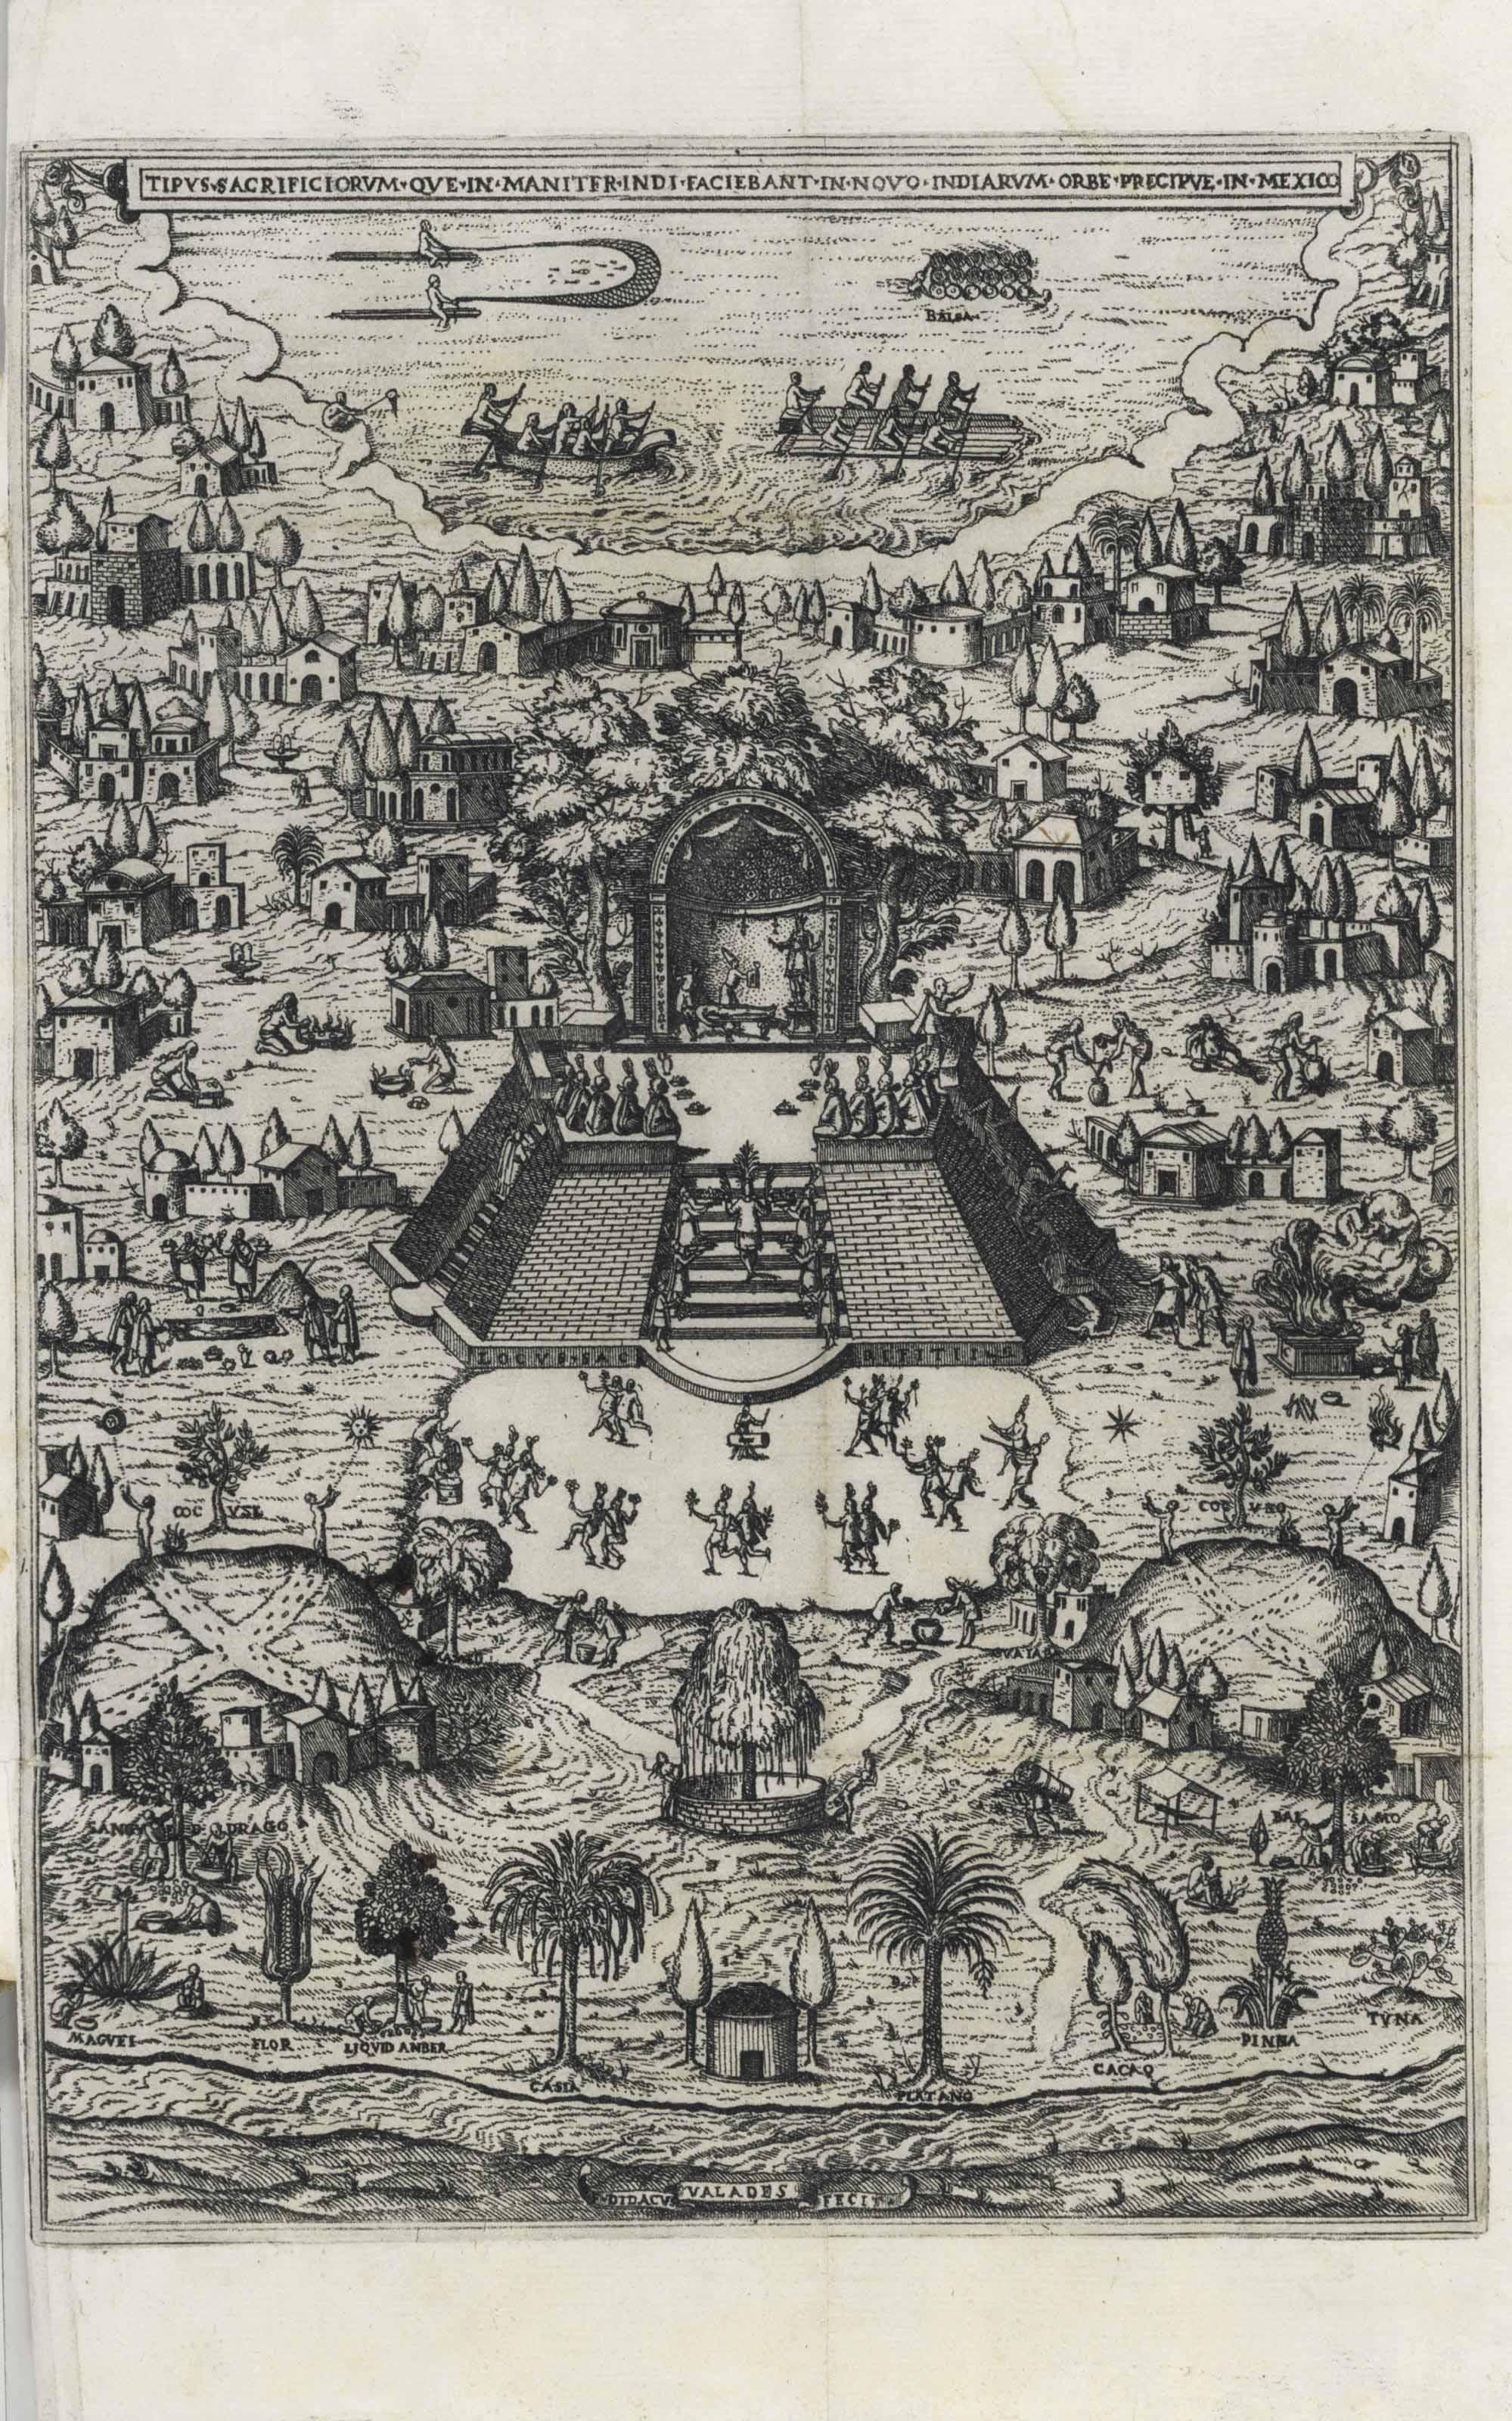 VALADÉS, Diego (b. 1533). Rhet